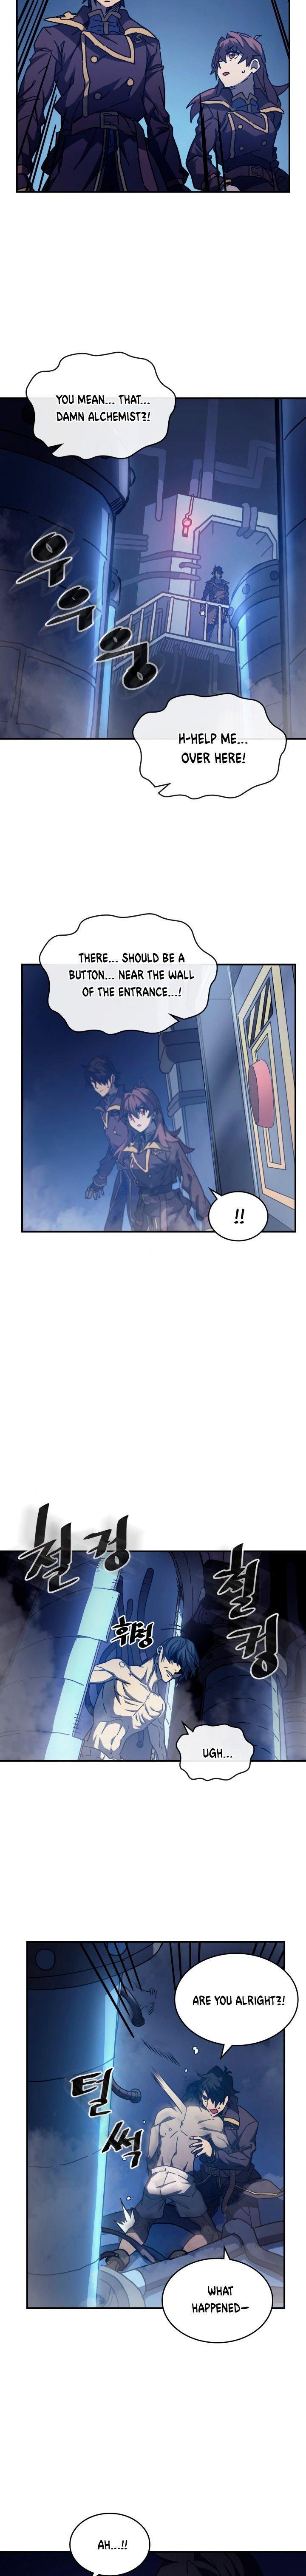 A Returner's Magic Should Be Special Chapter 128 page 6 - Mangakakalots.com